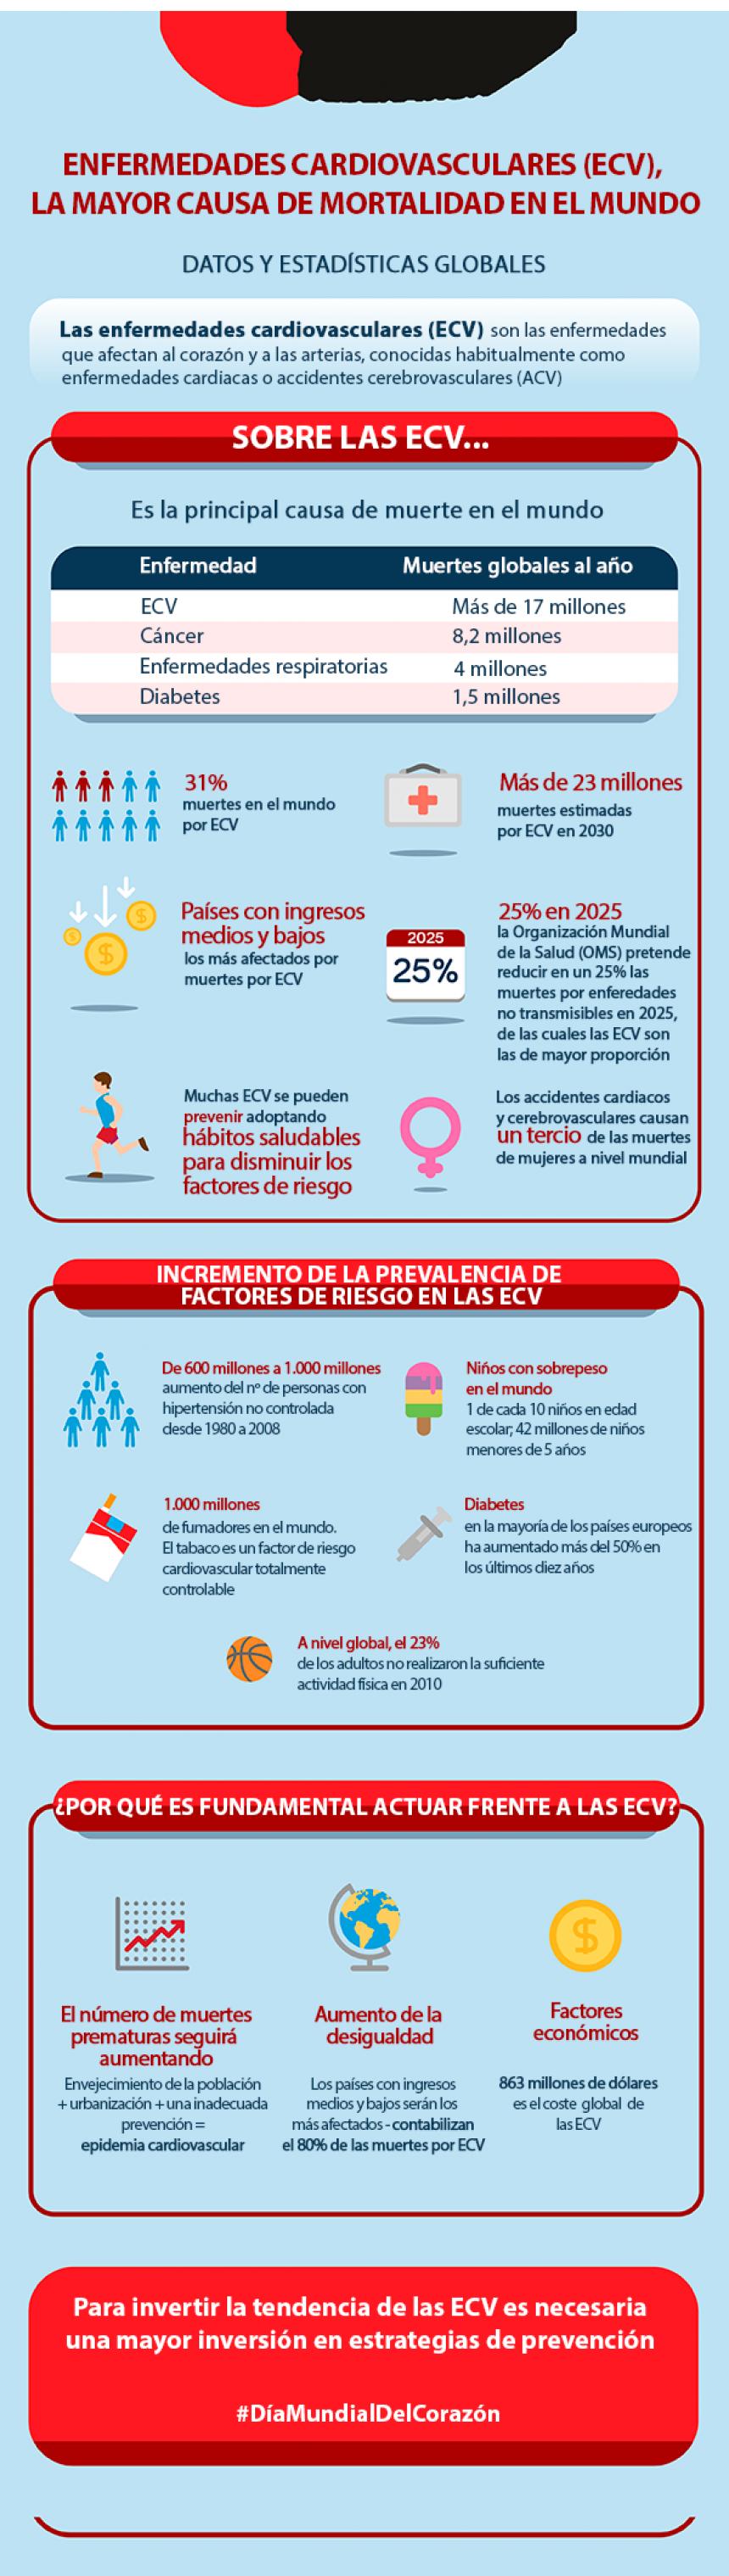 WCC2016_ECV_infografia.png